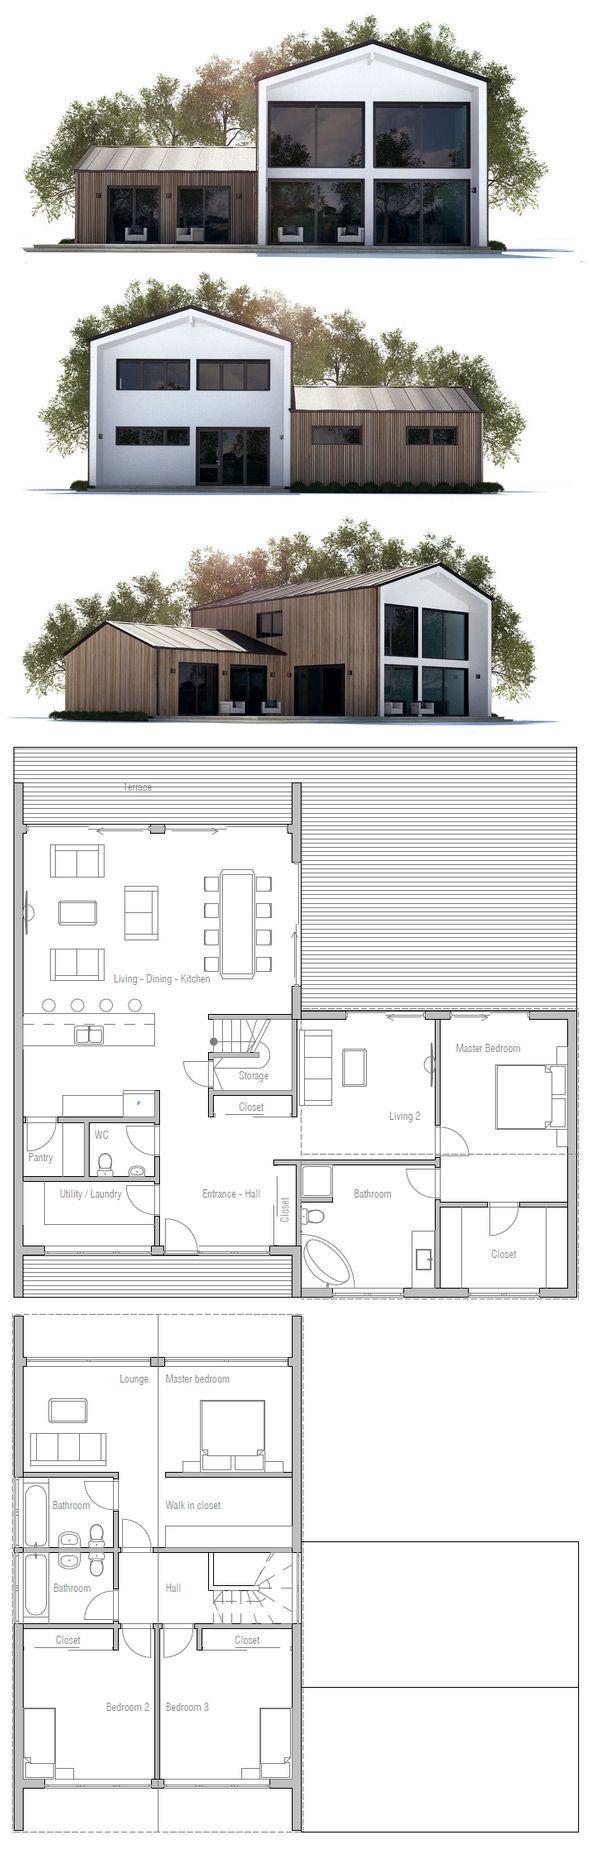 Küchenplan grundriss plan de petite maison plus  casas rurales  pinterest  haus haus